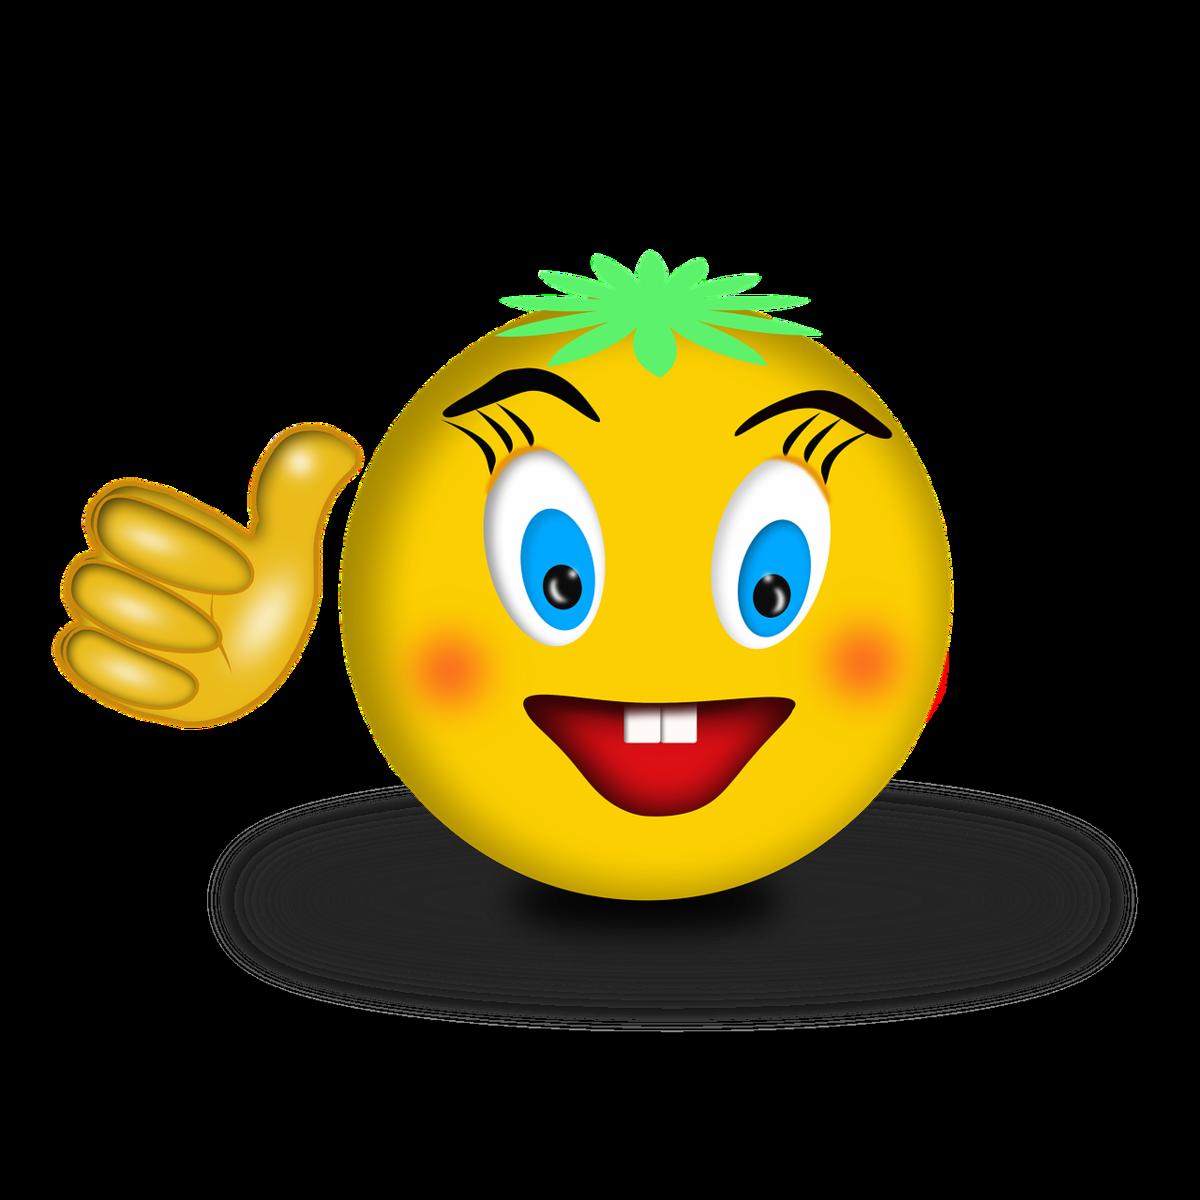 https://avatars.mds.yandex.net/get-pdb/1677265/02793325-ca99-407c-9541-c5880e7b4629/s1200